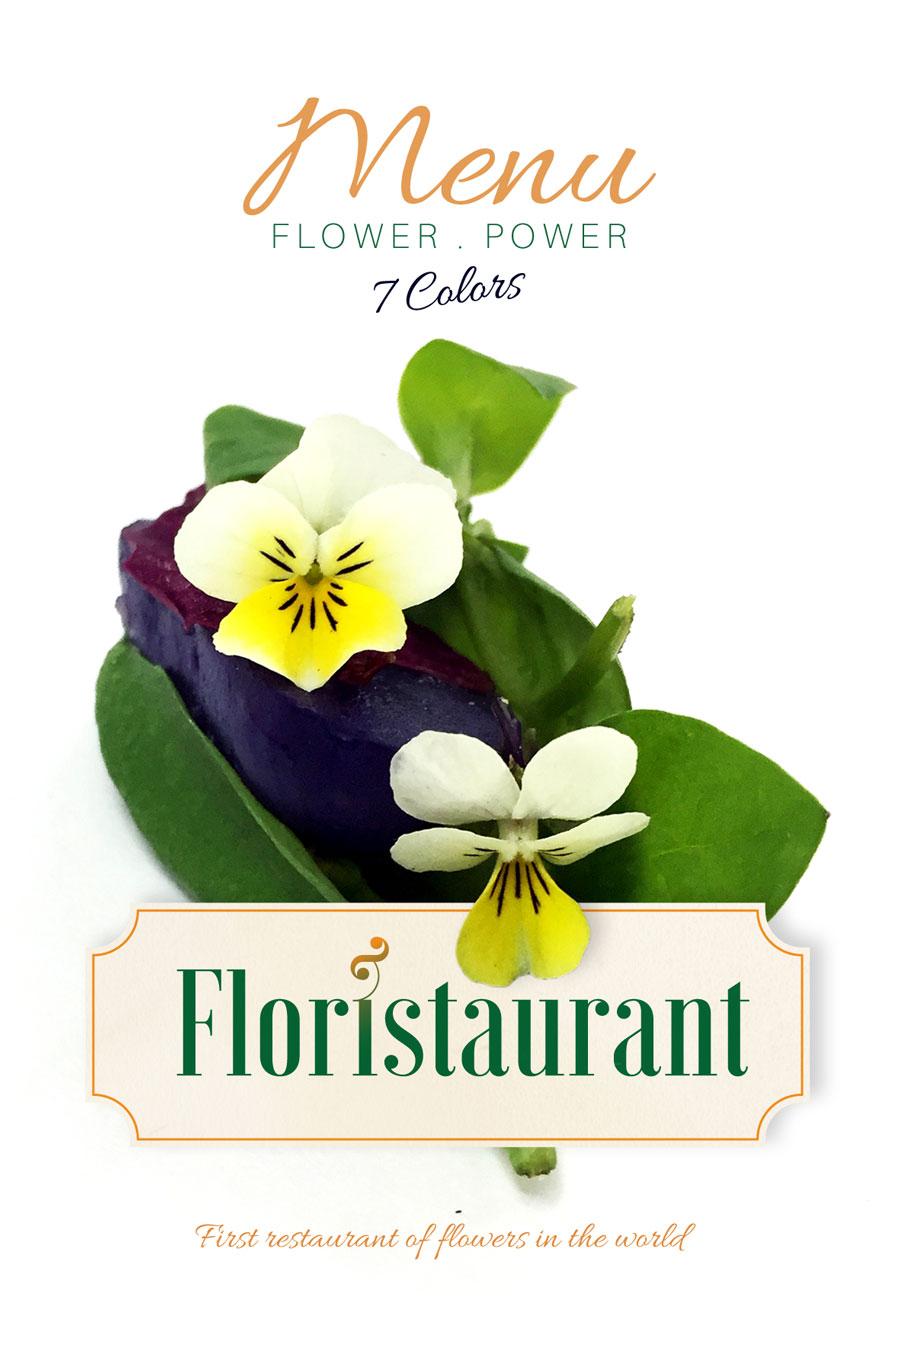 Floristaurant (2016) - Marisa Benjamim